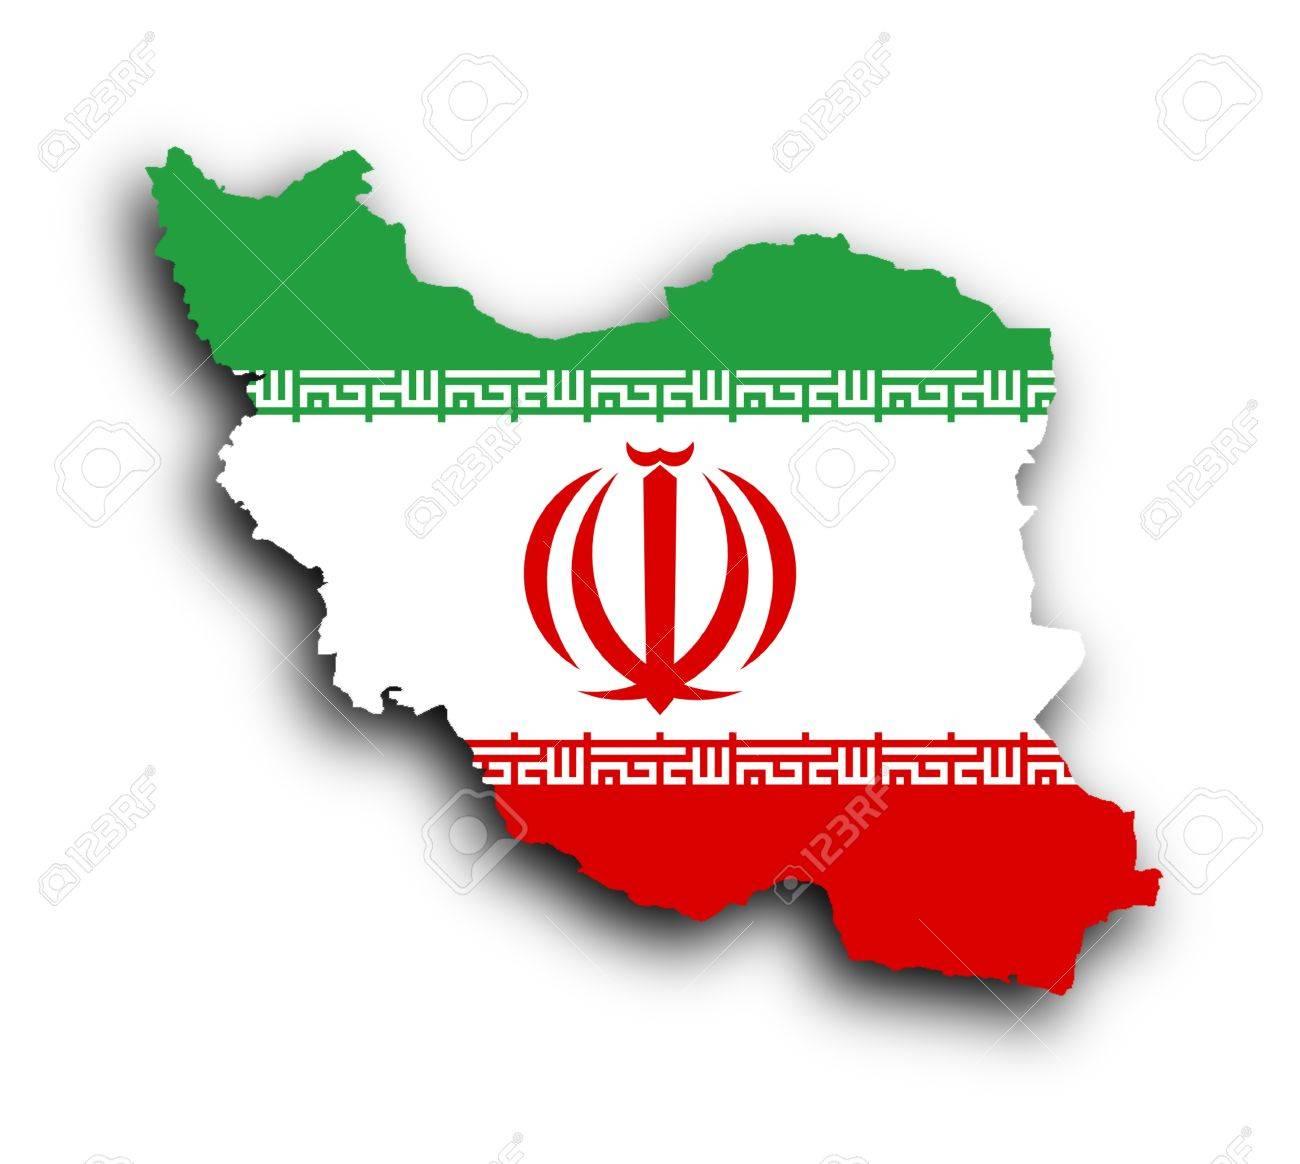 Map of iran and iranian flag illustration isolated stock photo map of iran and iranian flag illustration isolated stock illustration 17734050 buycottarizona Choice Image